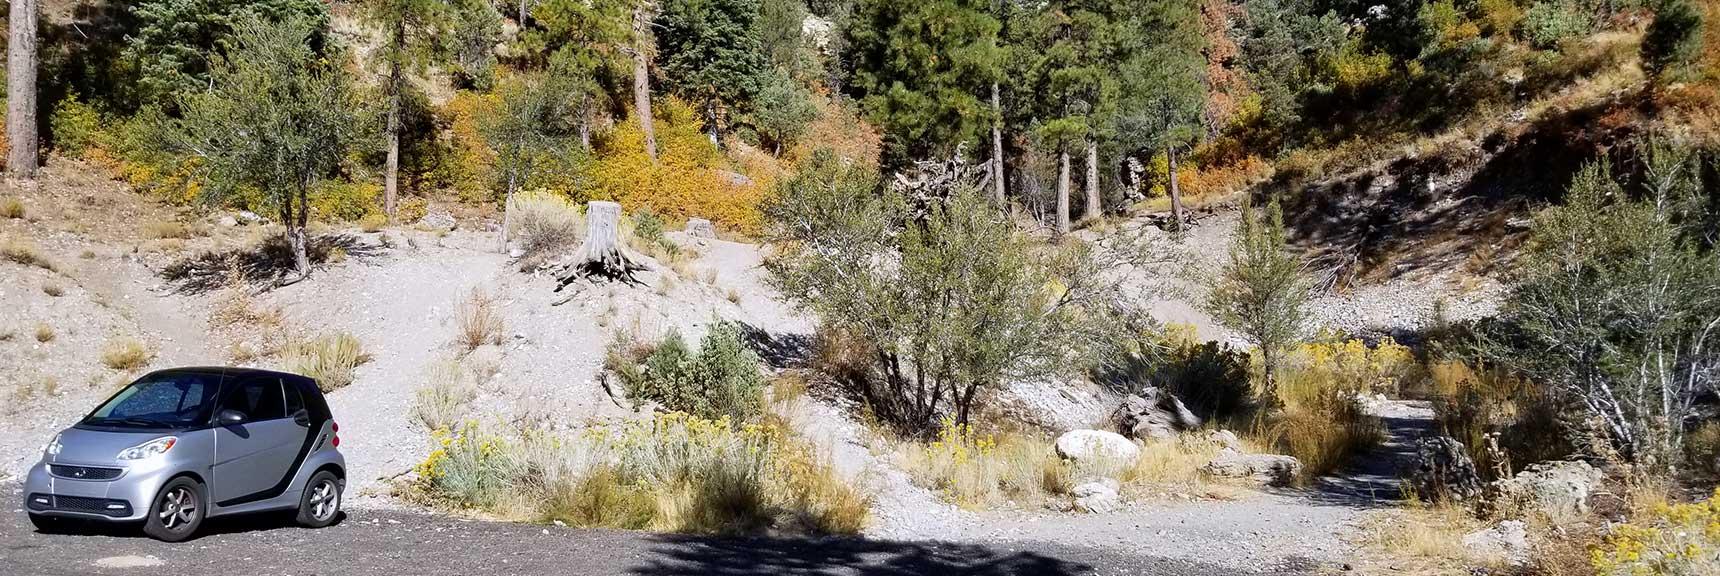 Unmarked Trailhead to Cockscomb Peak and Ridge in Mt. Charleston Wilderness, Nevada